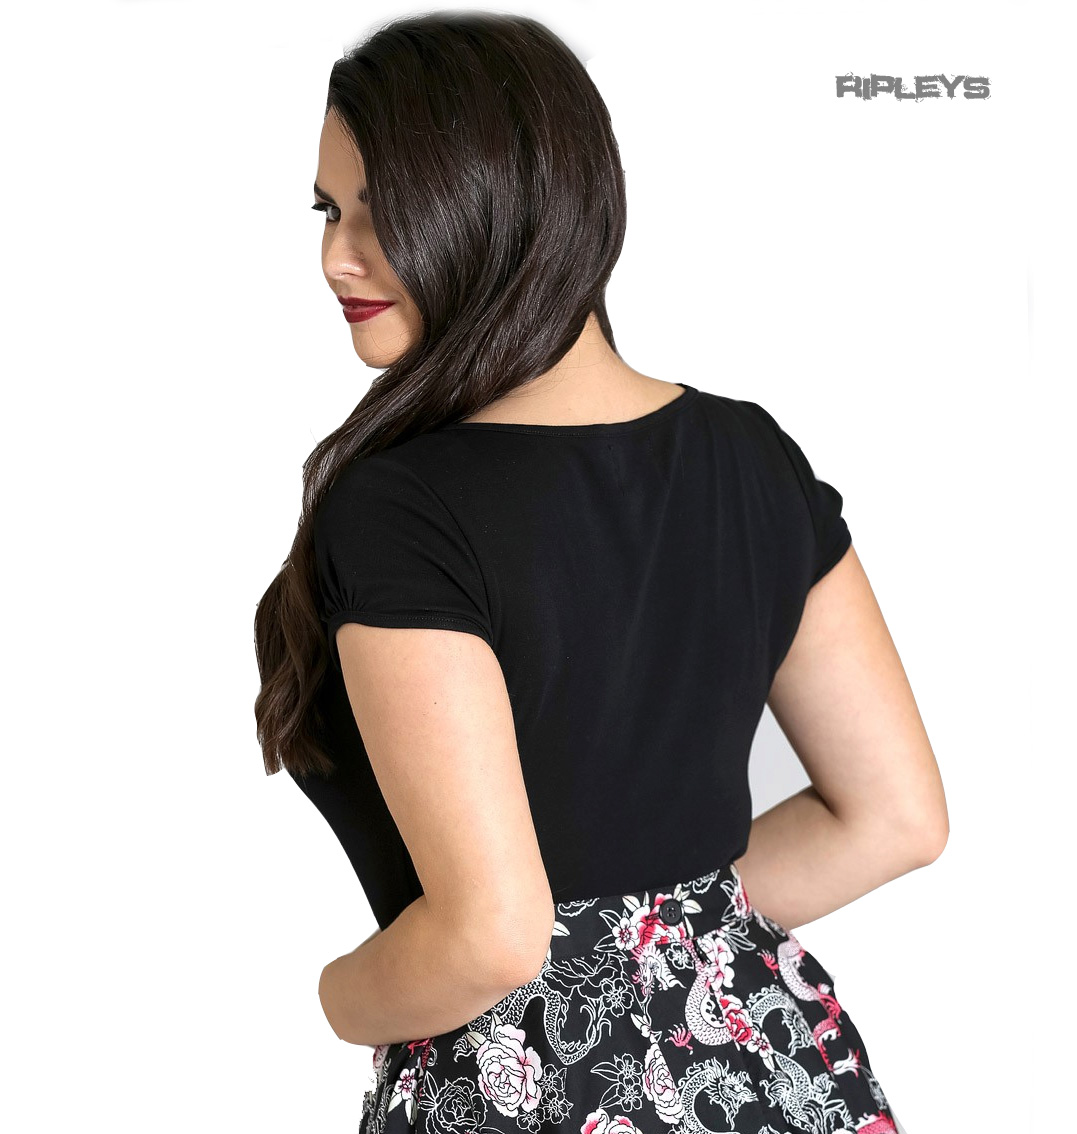 Hell-Bunny-Shirt-50s-Rockabilly-Top-MIA-Plain-Black-Short-Sleeves-All-Sizes thumbnail 34